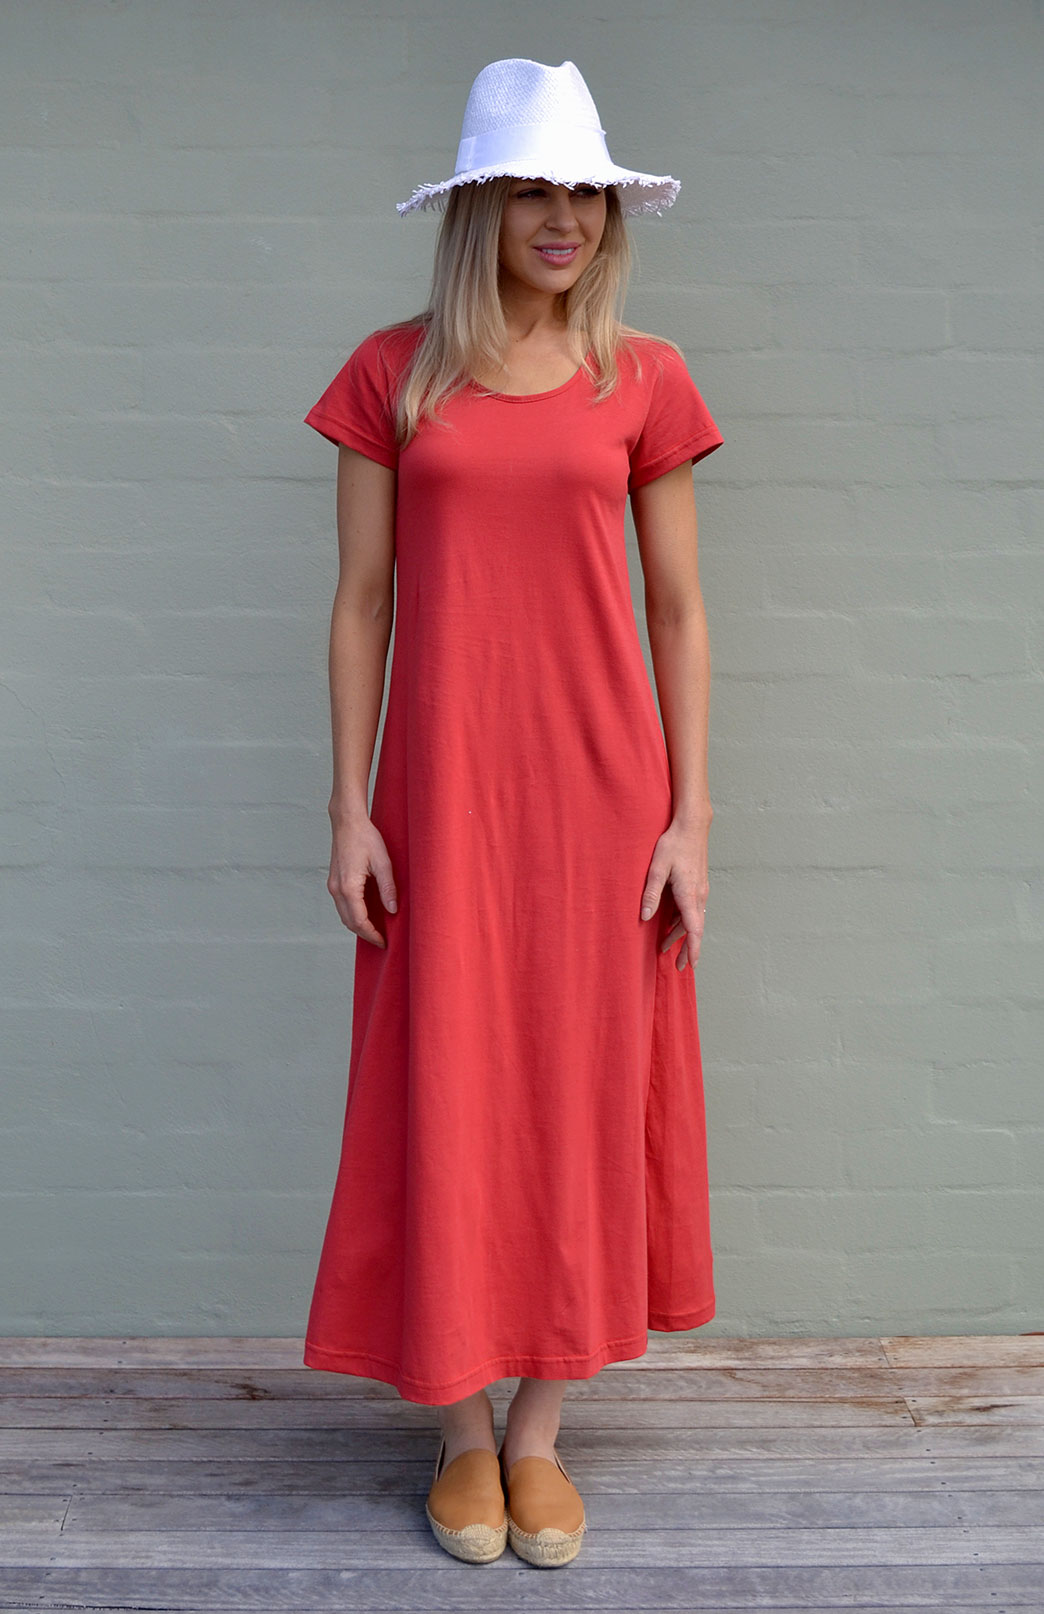 Organic Cotton T-Shirt Dress | Women's Ruby Red Organic ...